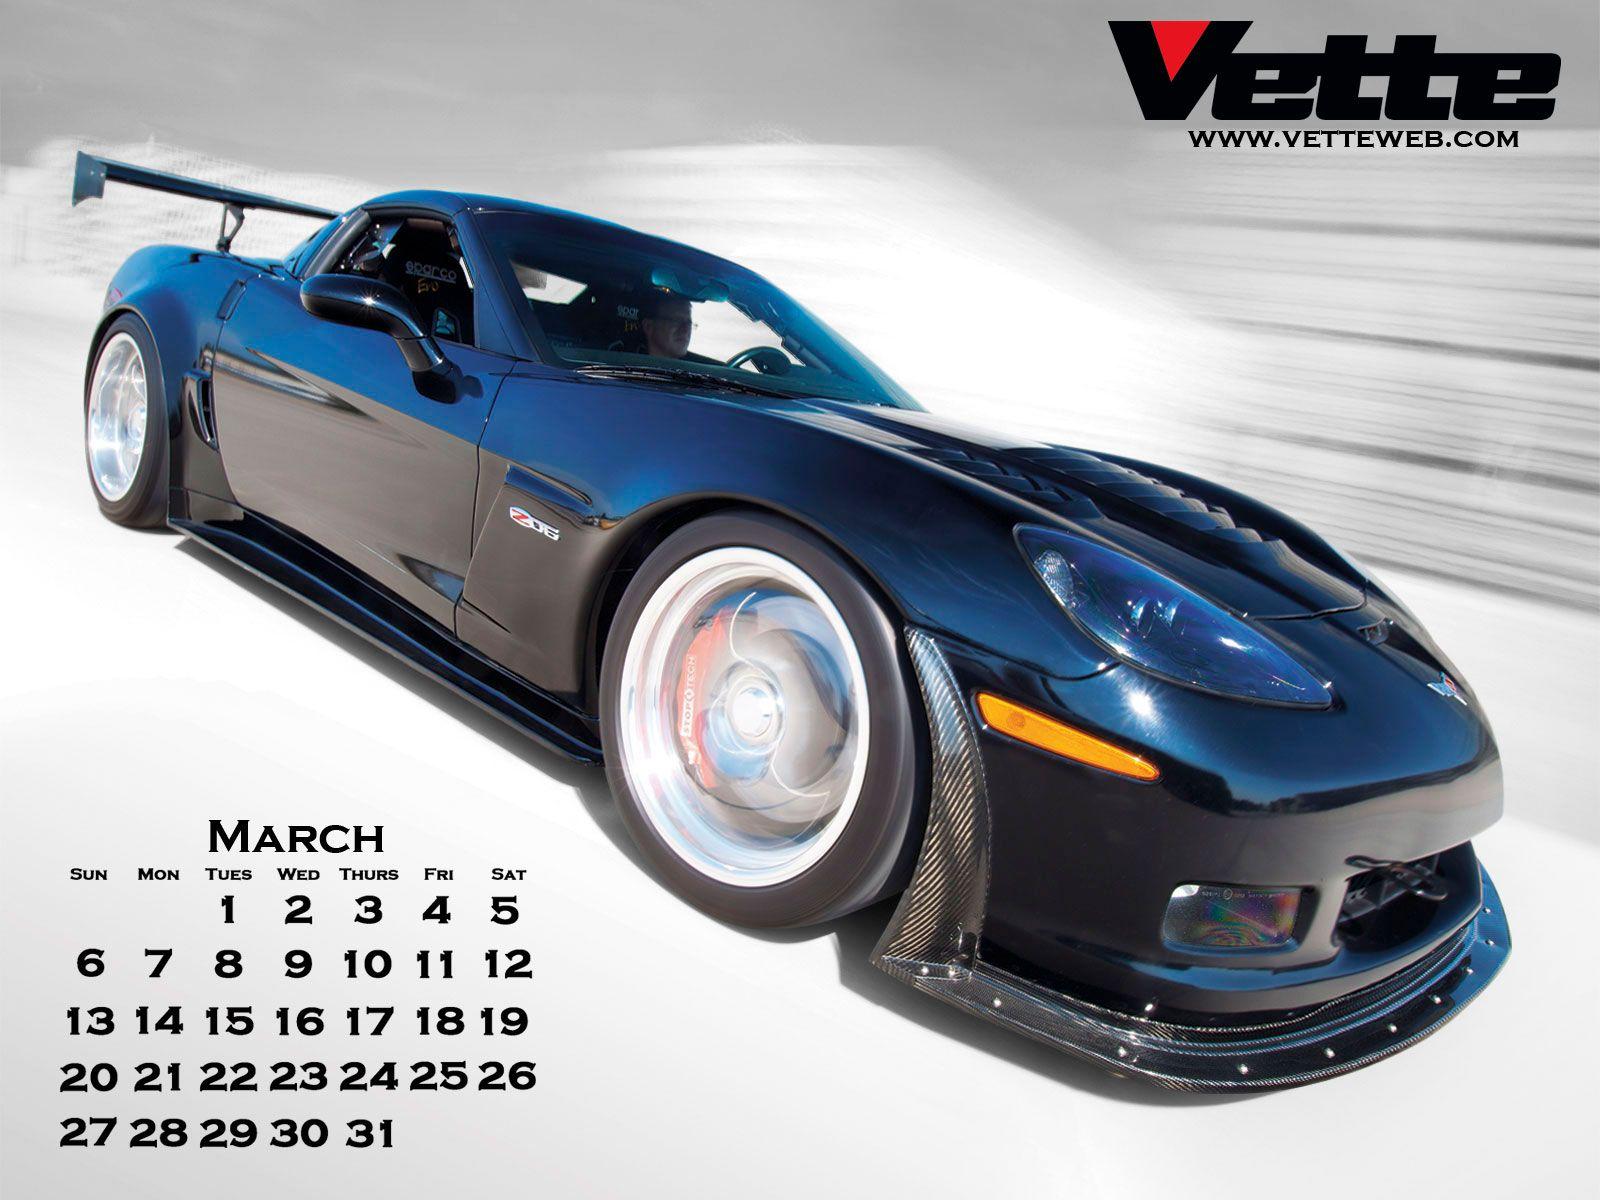 tt e Magazines Corvette Wallpapers 1600x1200